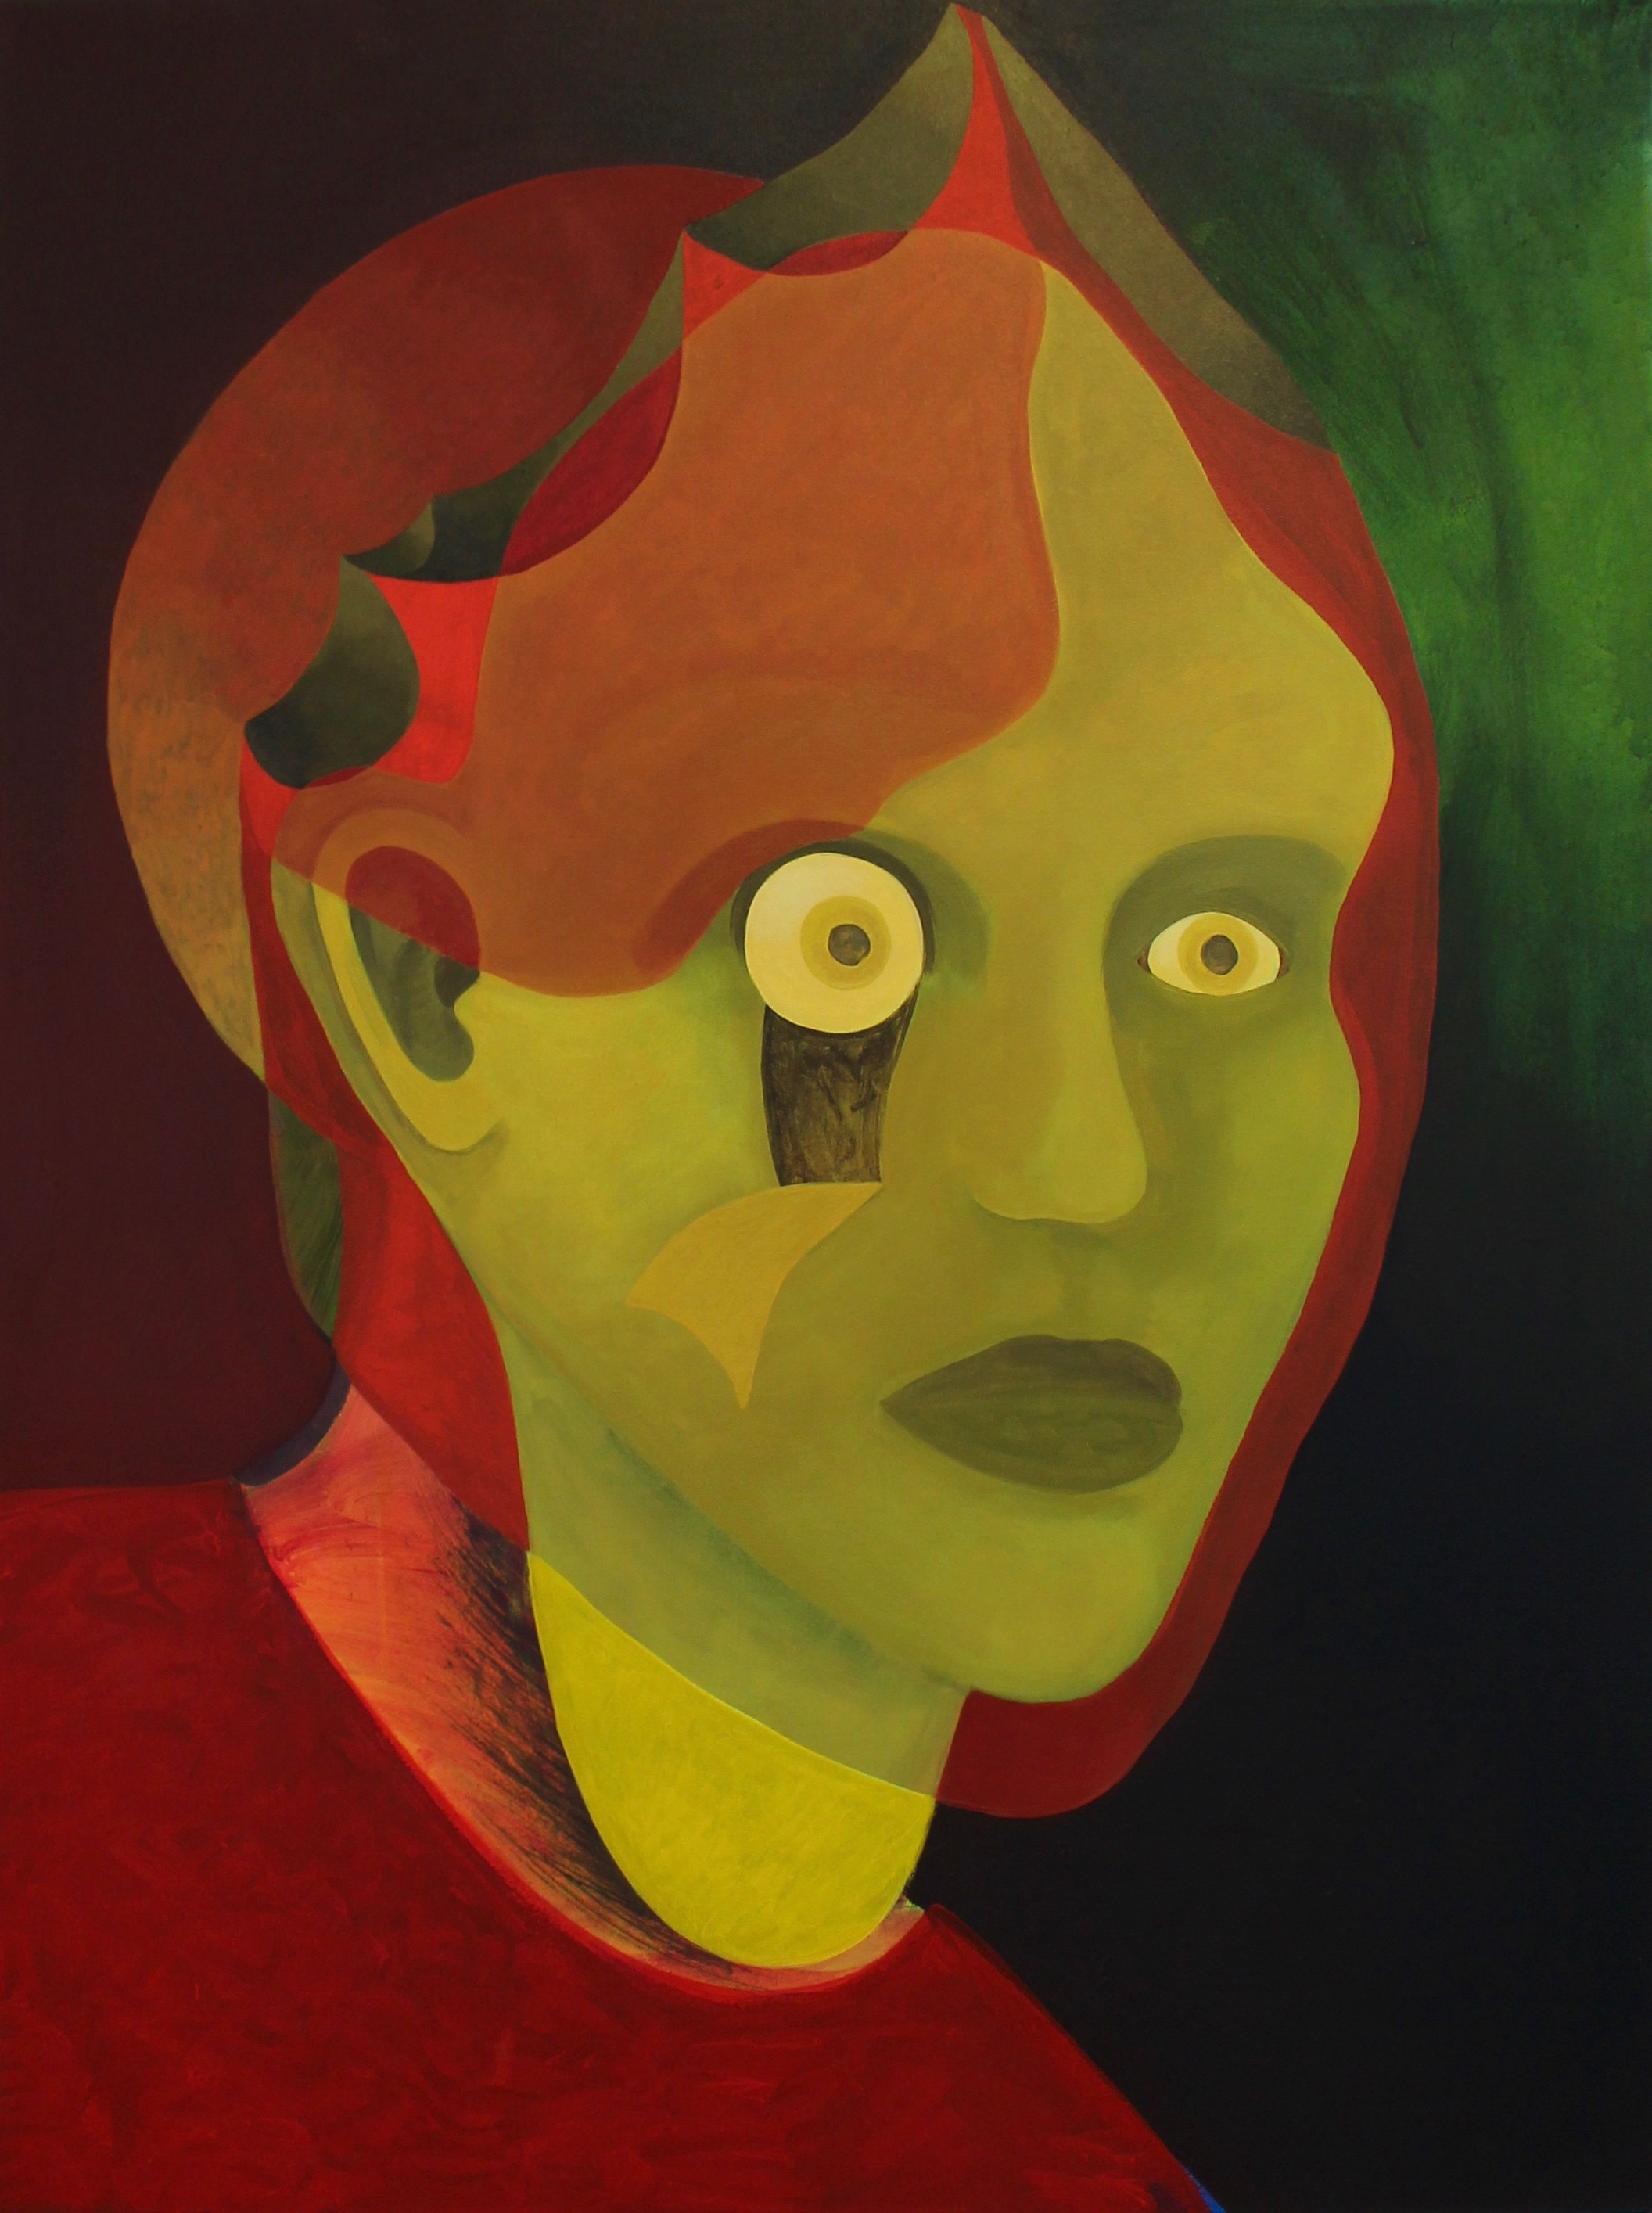 Kristen Sanders  Head/Stone , 2018 Acrylic on canvas 30 x 40 inches